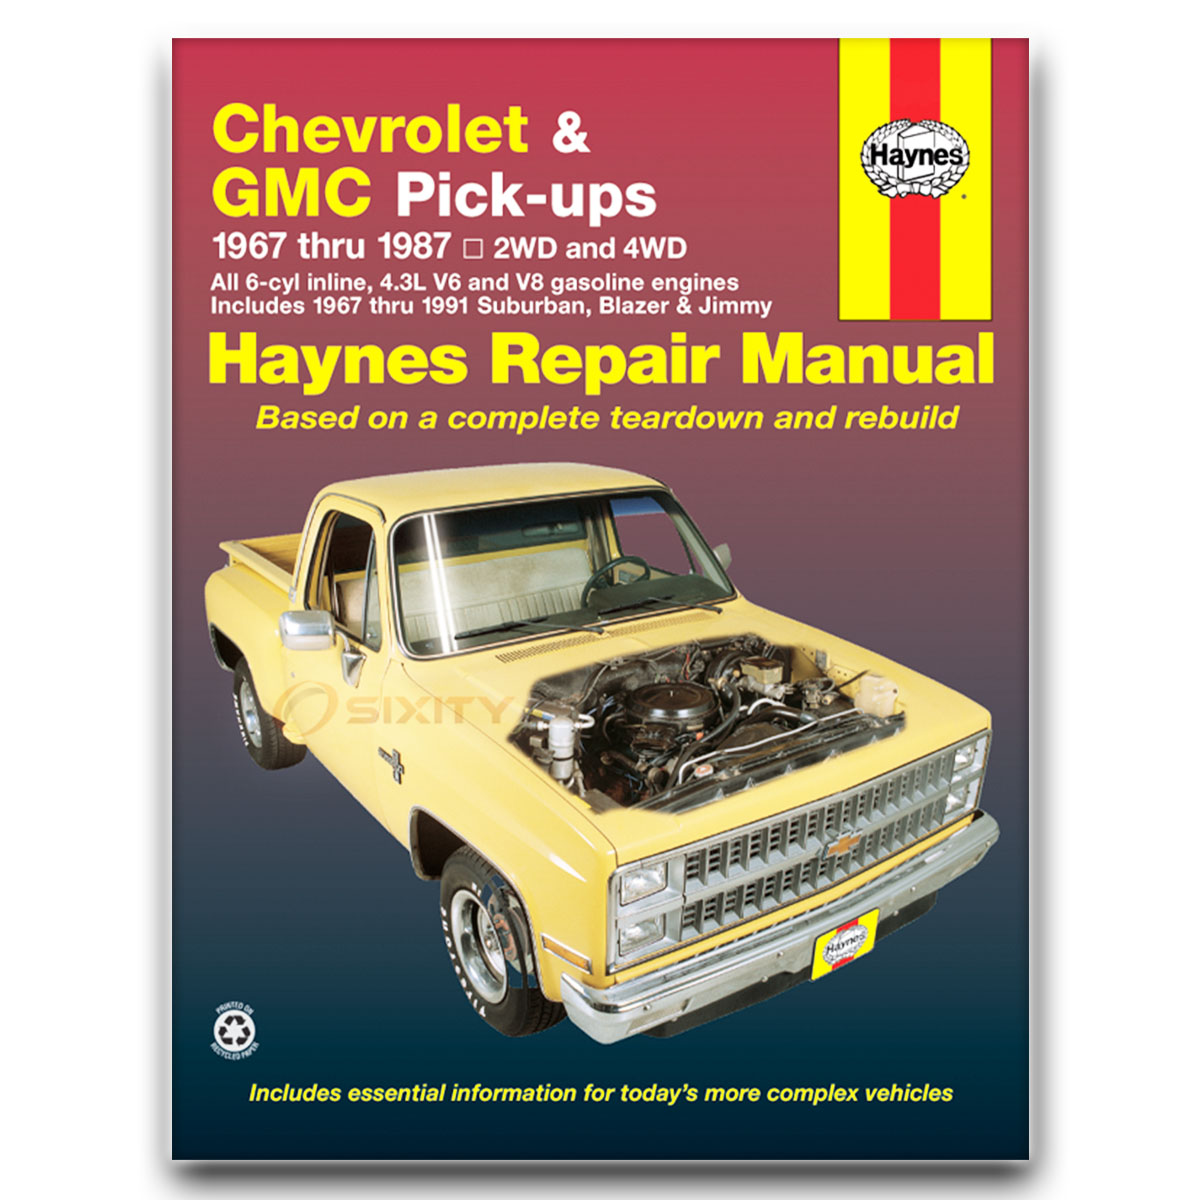 Haynes Repair Manual for Chevy C20 Suburban Custom Deluxe Scottsdale dq